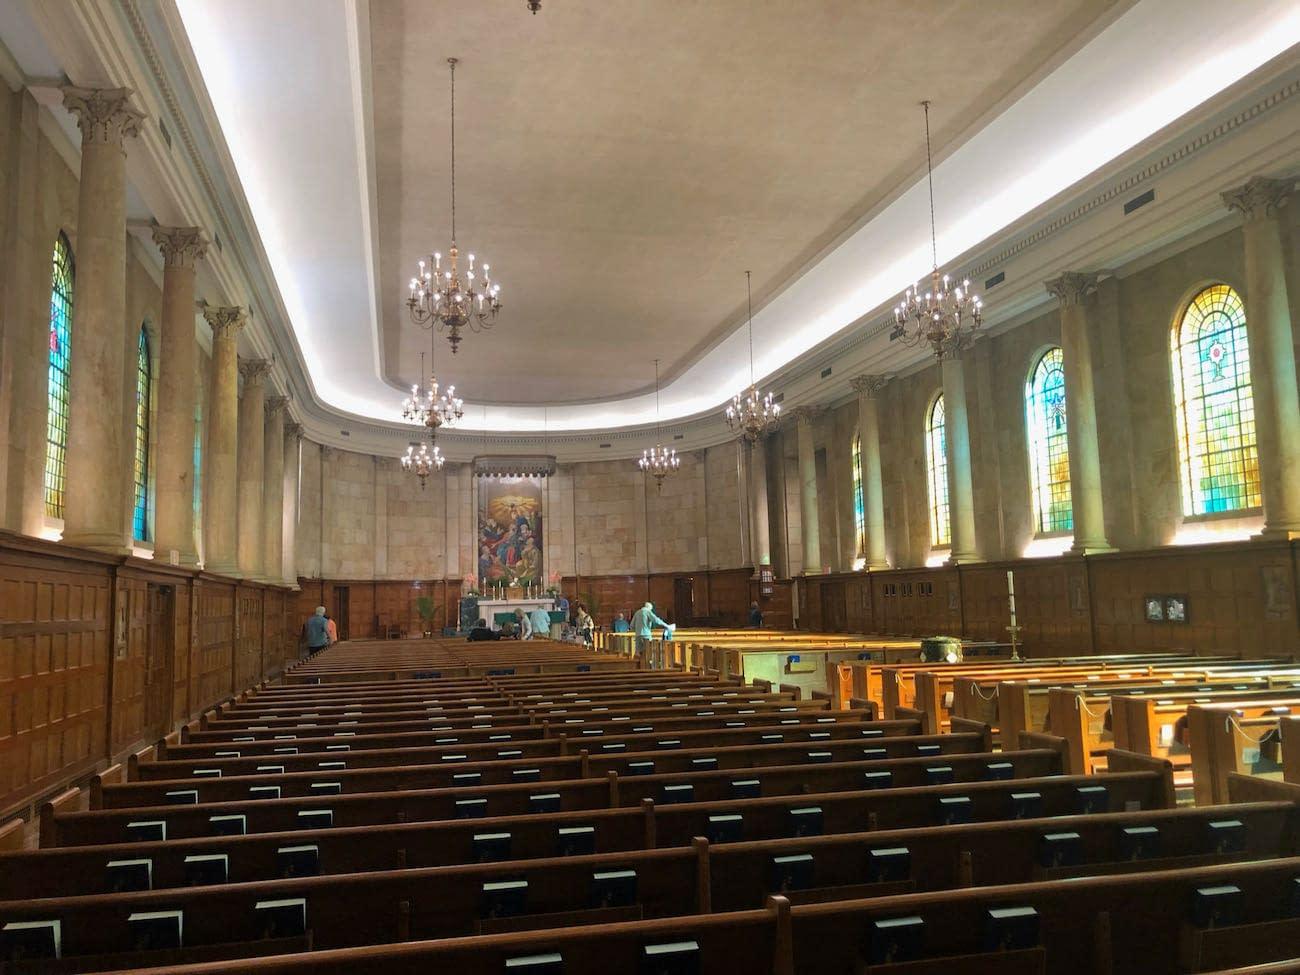 Whole Interior of Holy Spirit